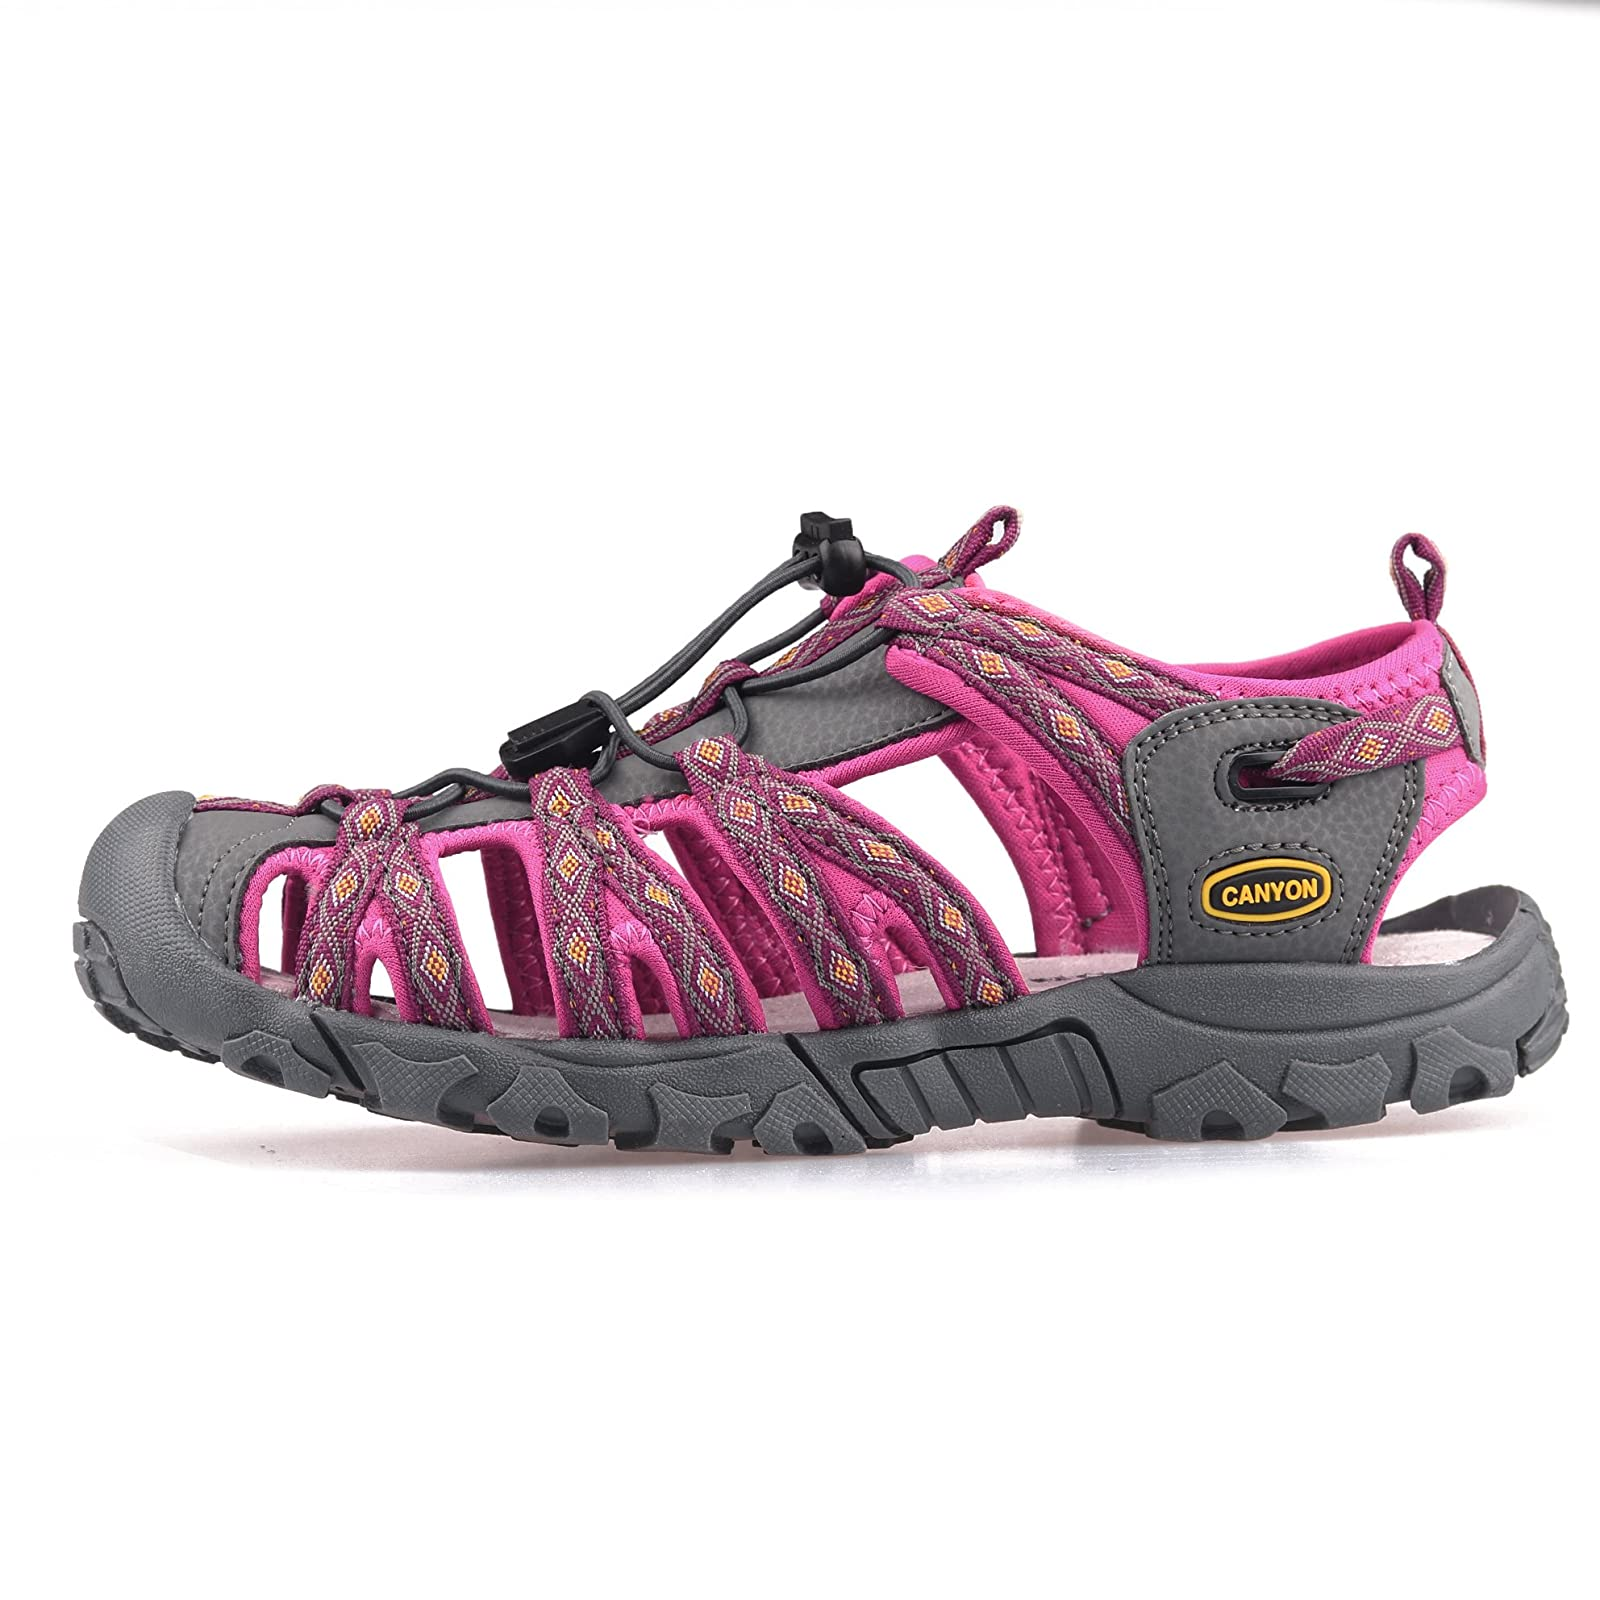 GRITION Women Outdoor Summer Sandals Adjustable Closed - 1